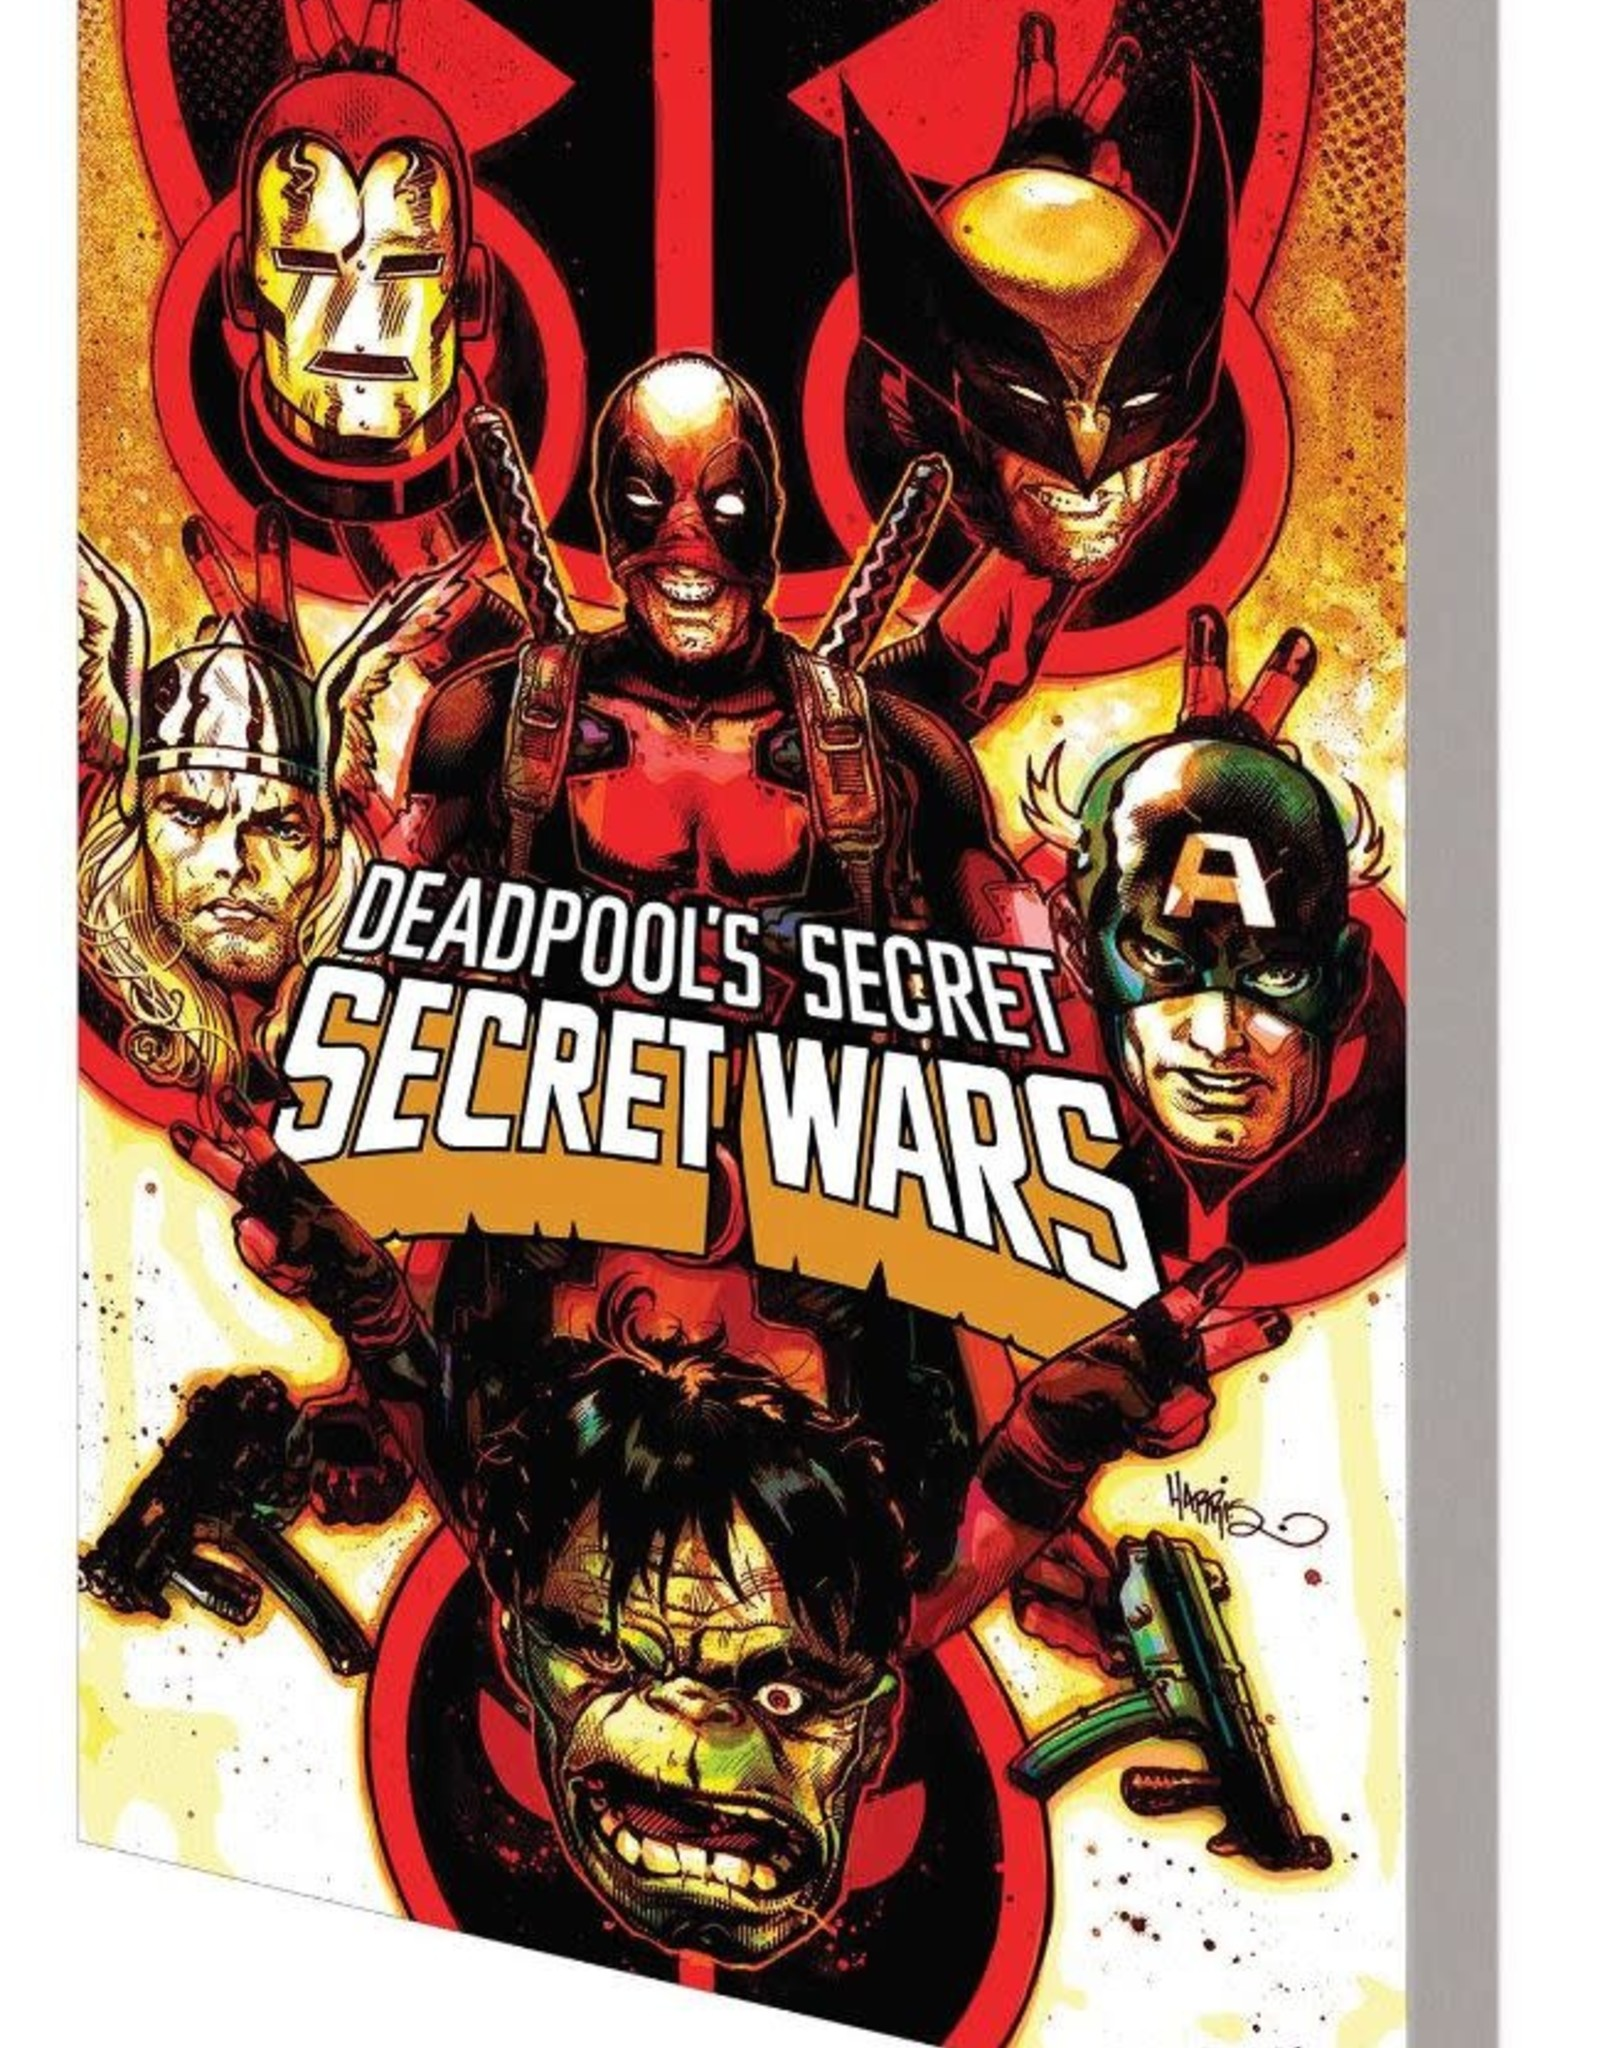 Marvel Comics Deadpool's Secret Secret Wars TP